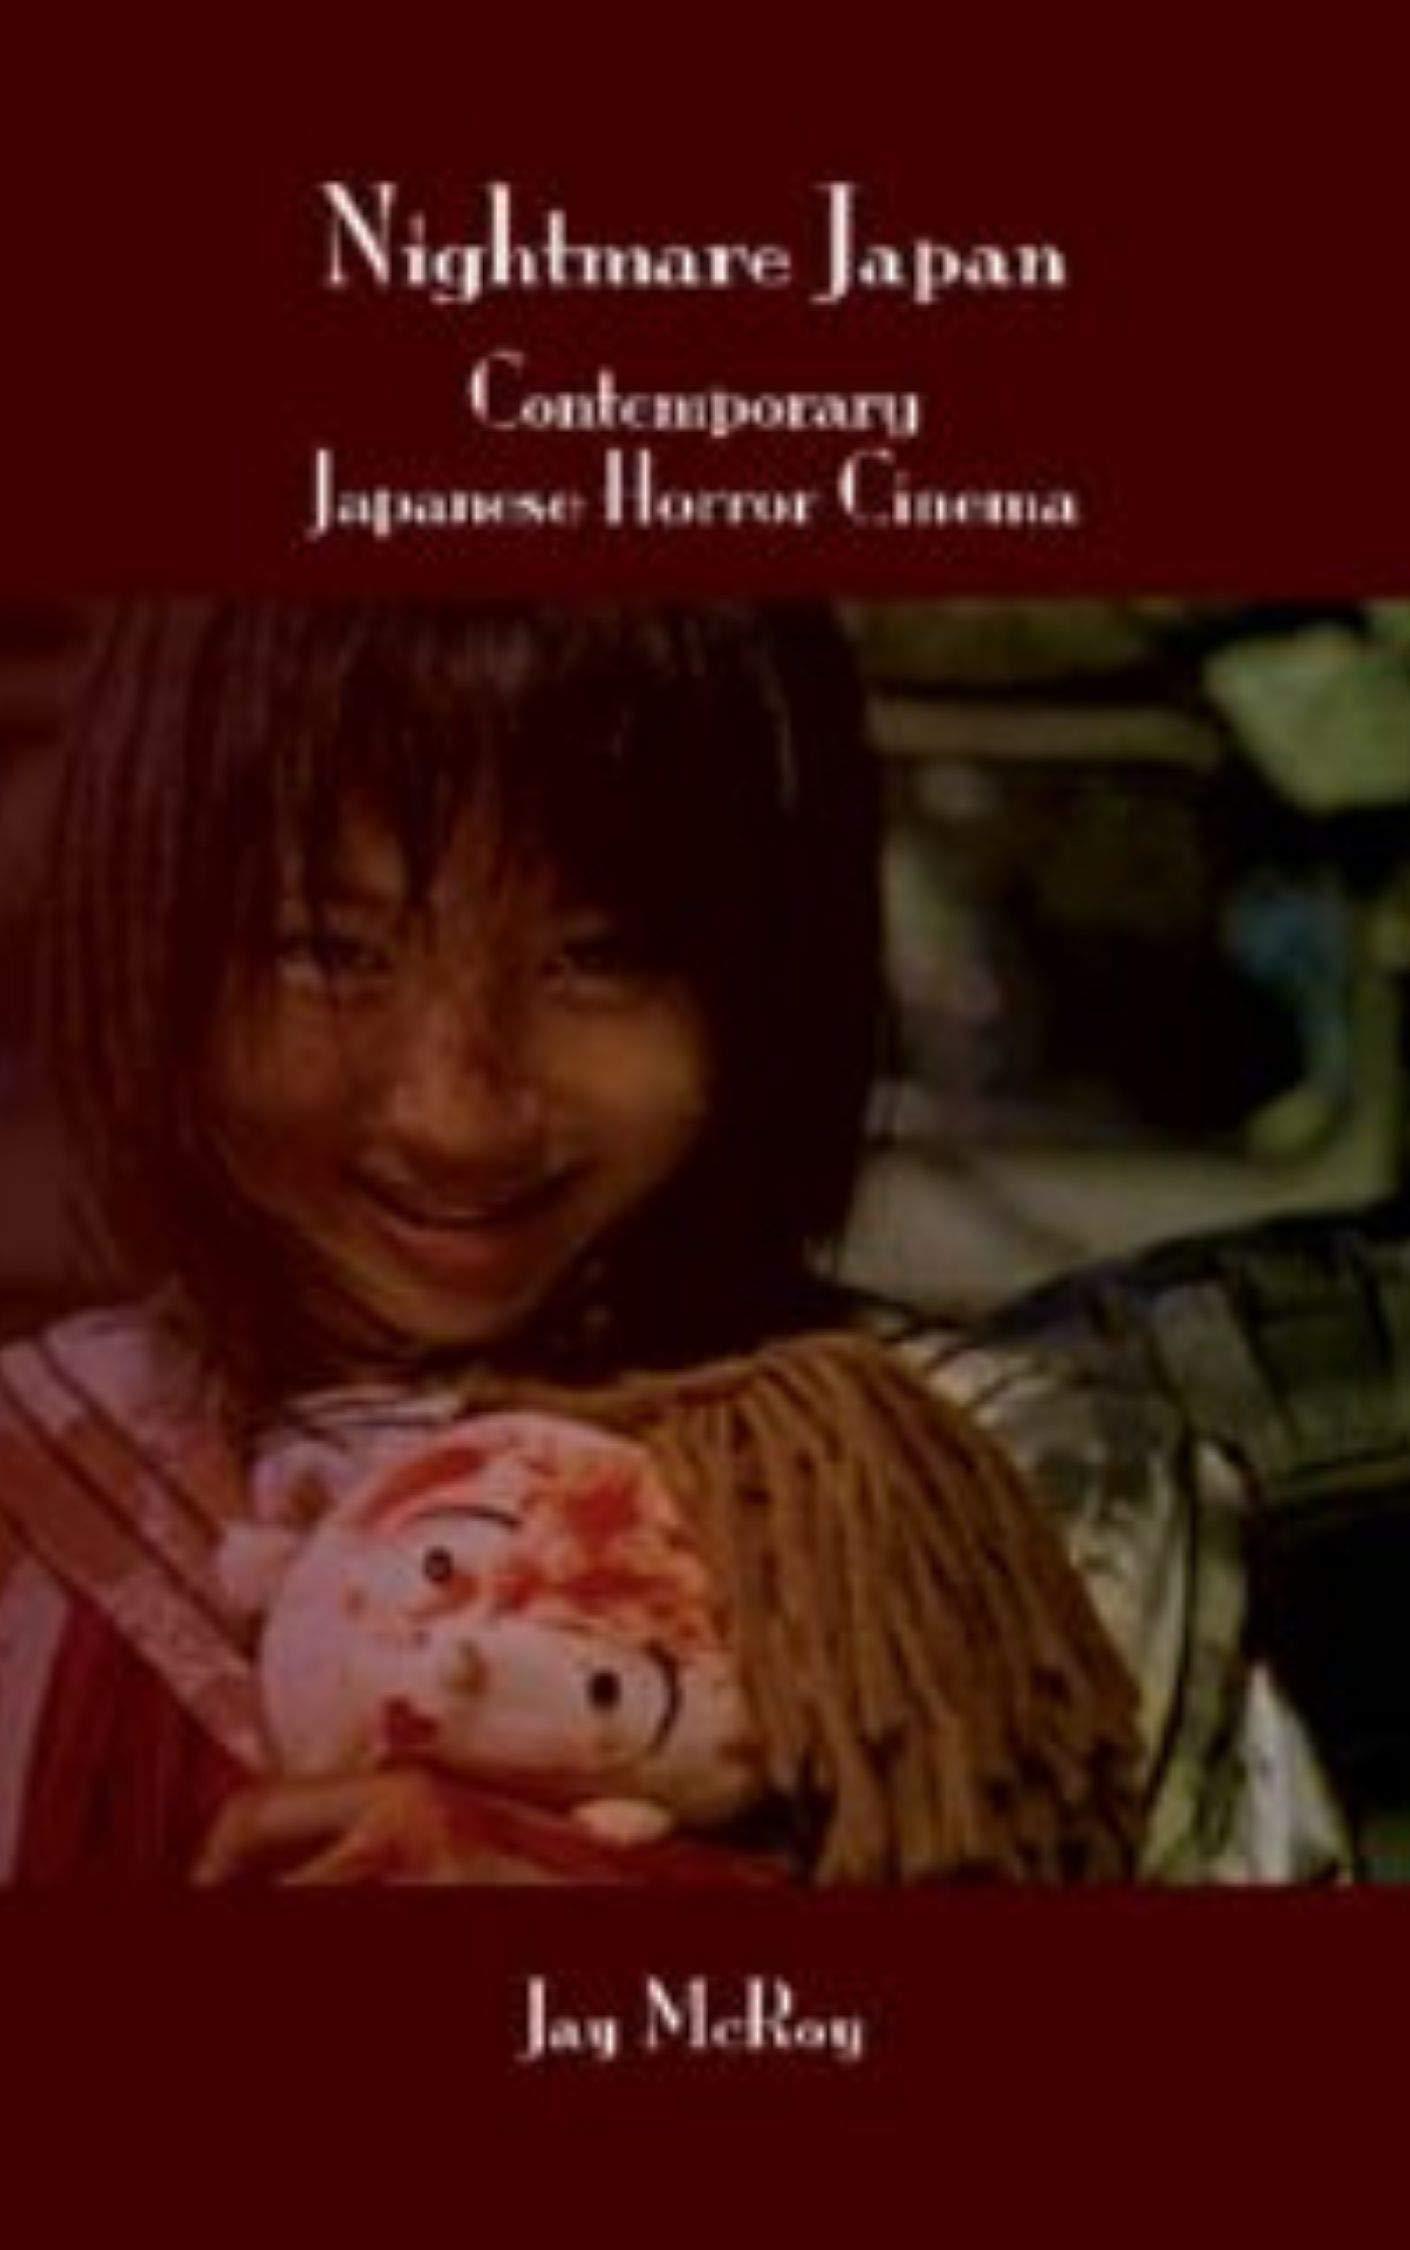 Nightmare Japan: Contemporary Japanese Horror Cinema.